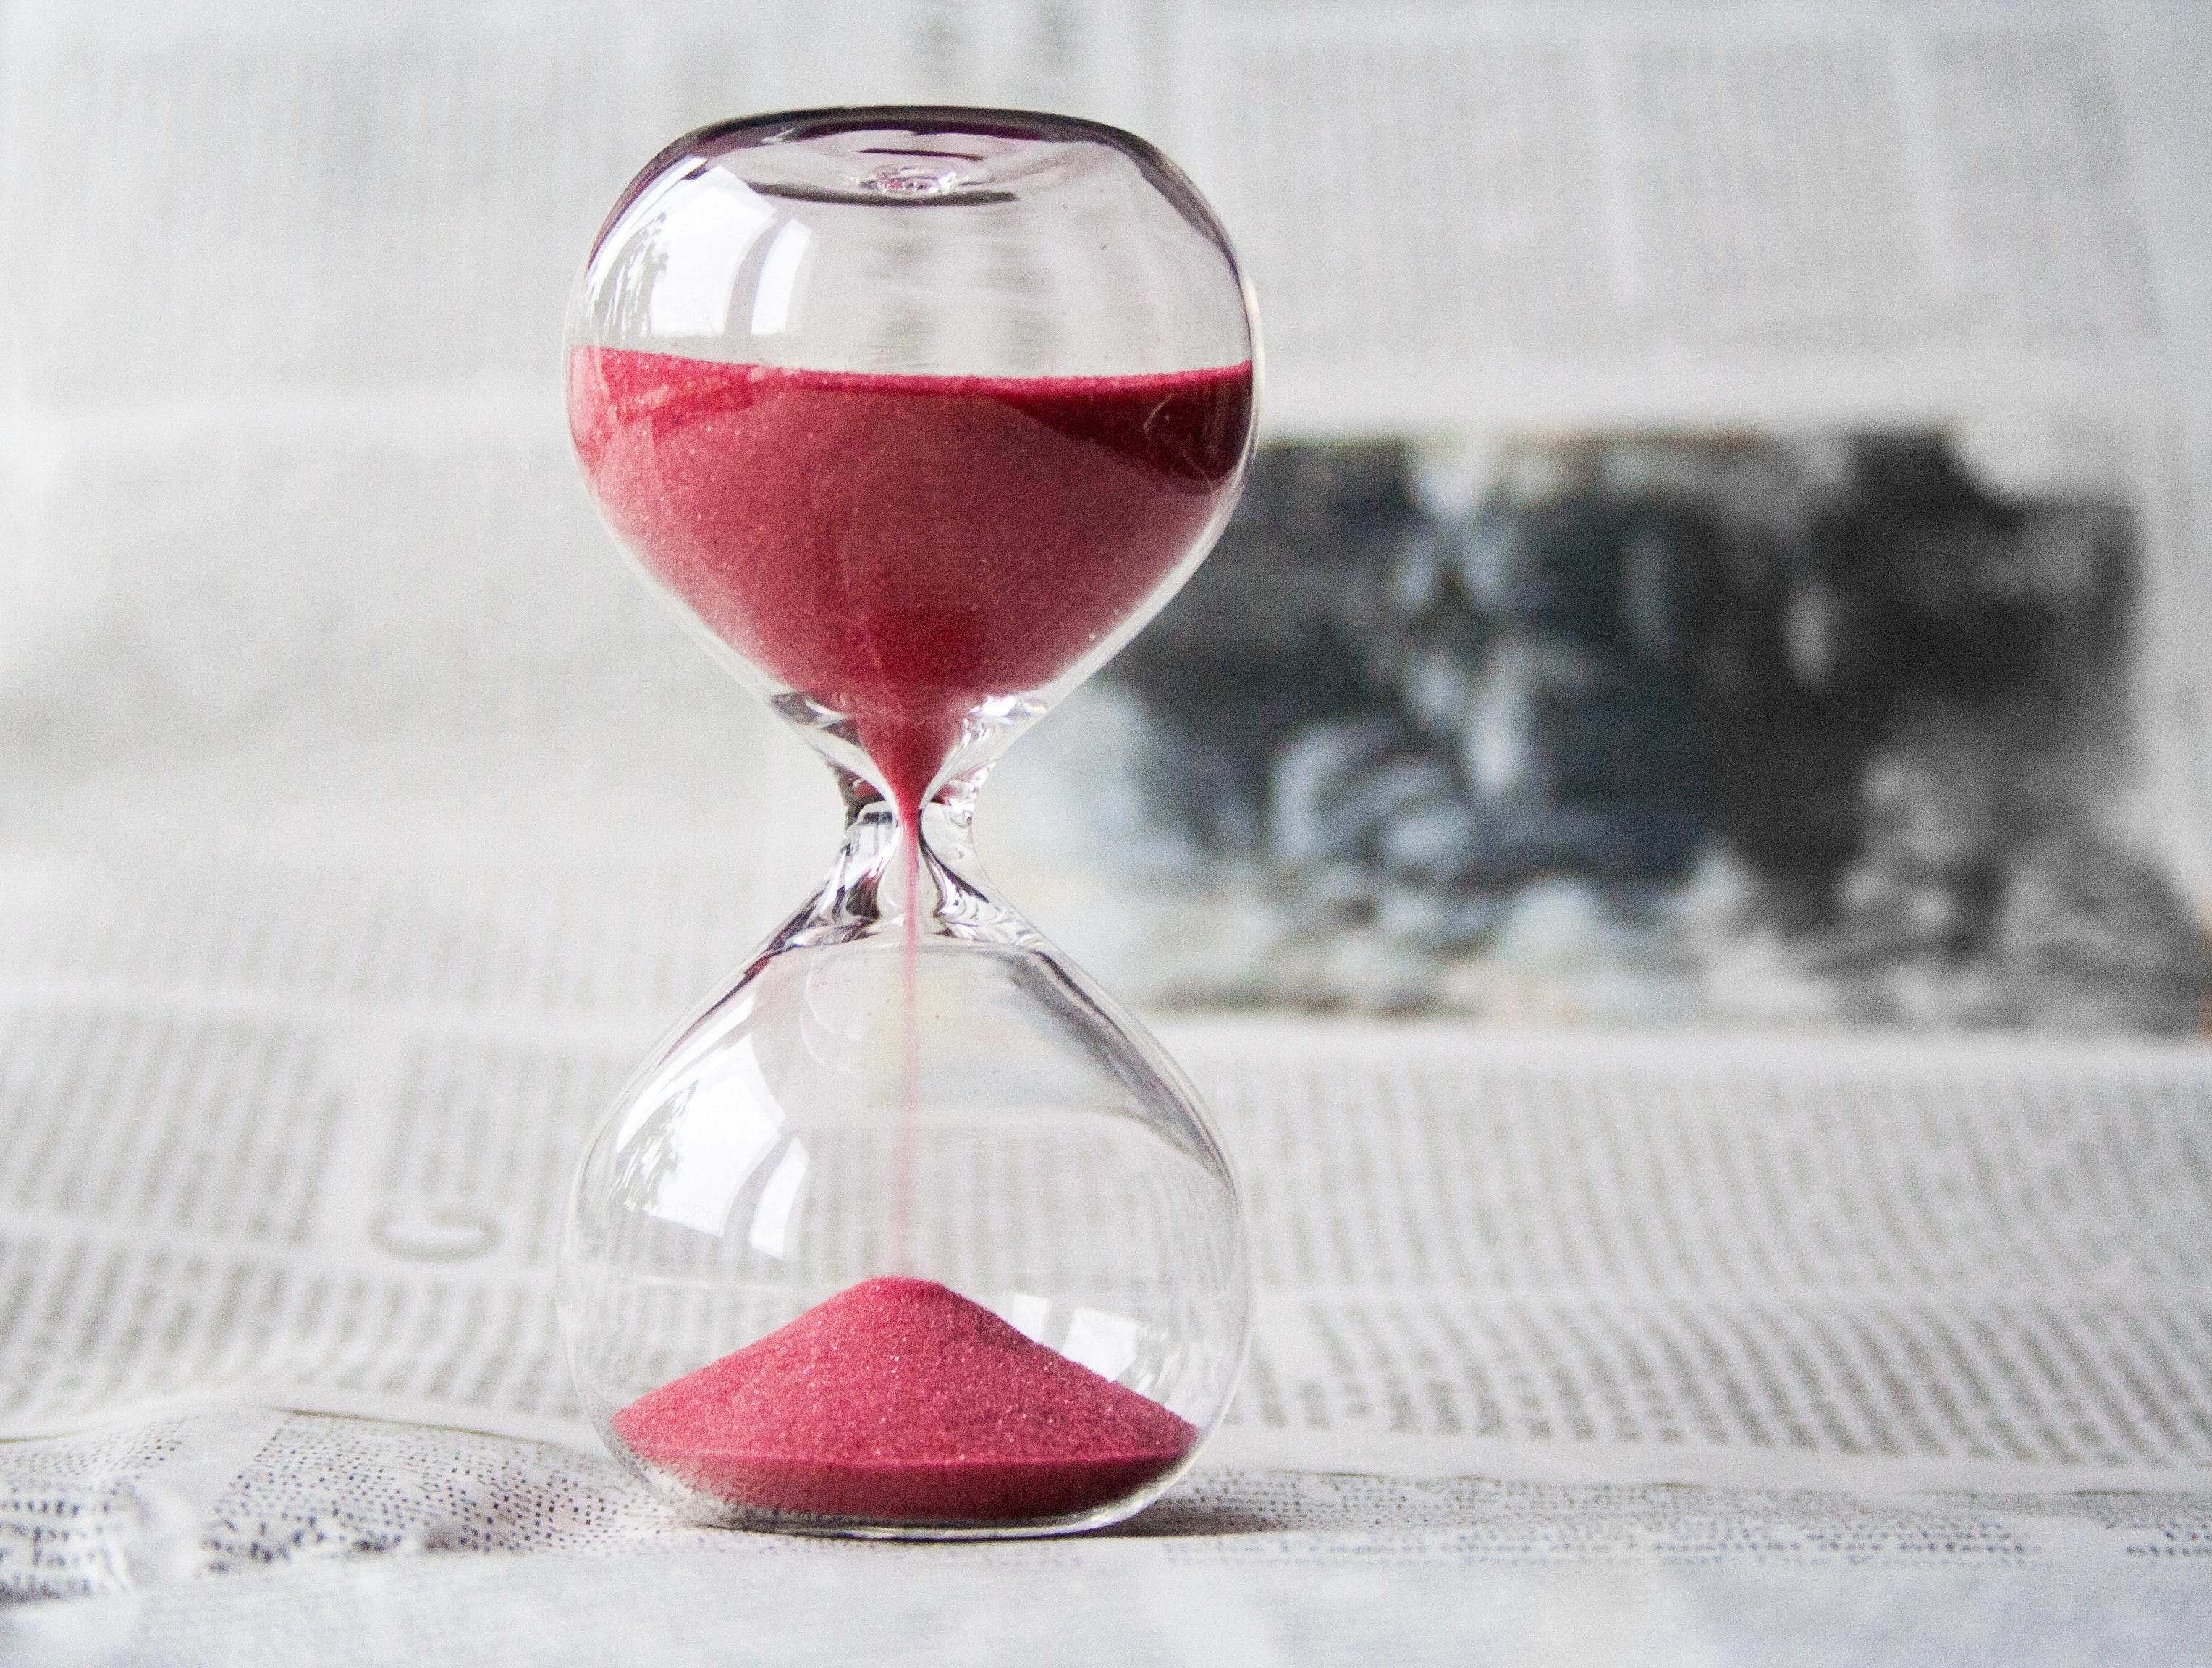 Time – Tarusha Singh